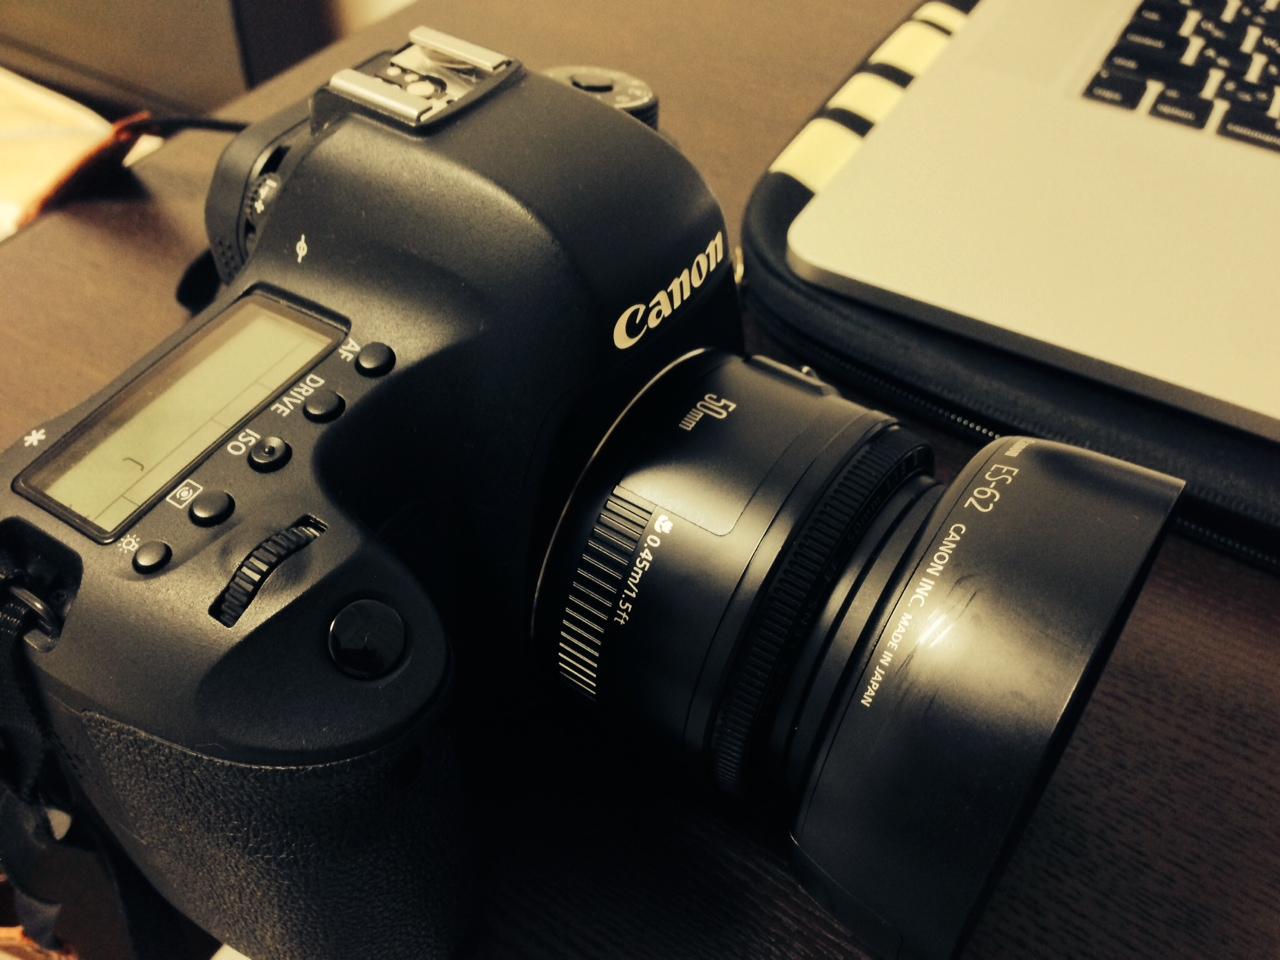 EF50mm F1.8Ⅱ